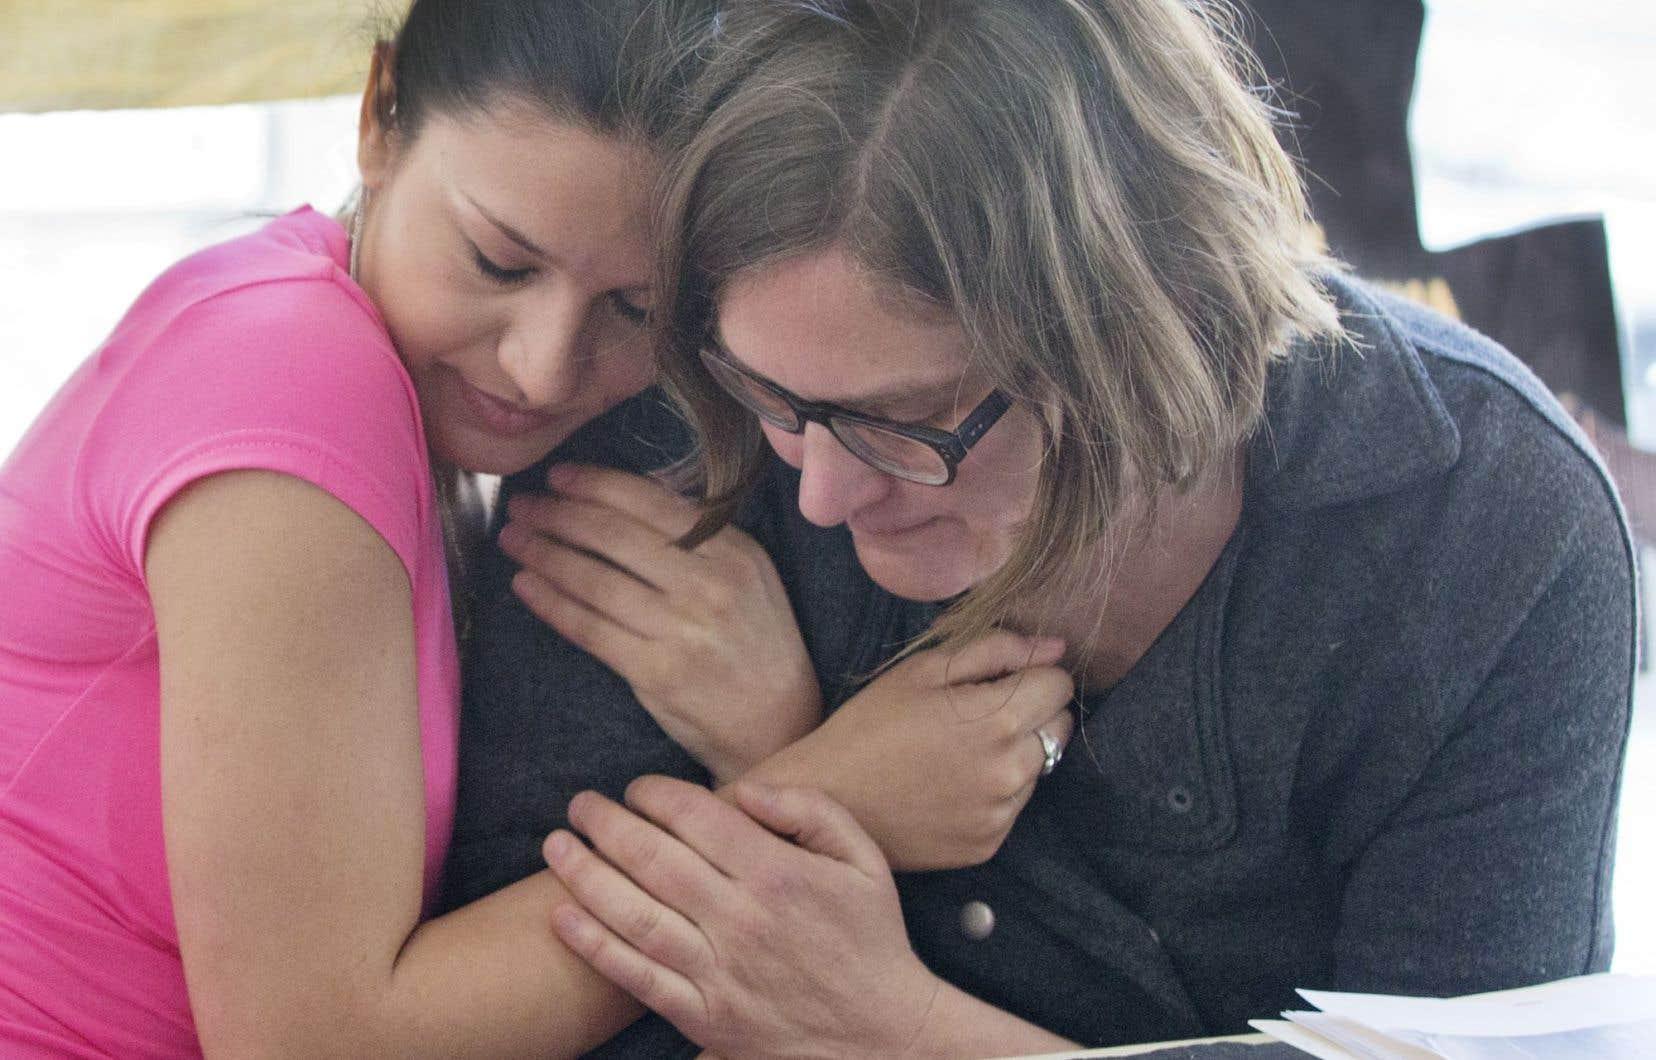 Gilda Lakatos (à gauche), en compagnie de l'intervenante Mary Foster, de Solidarité sans frontières